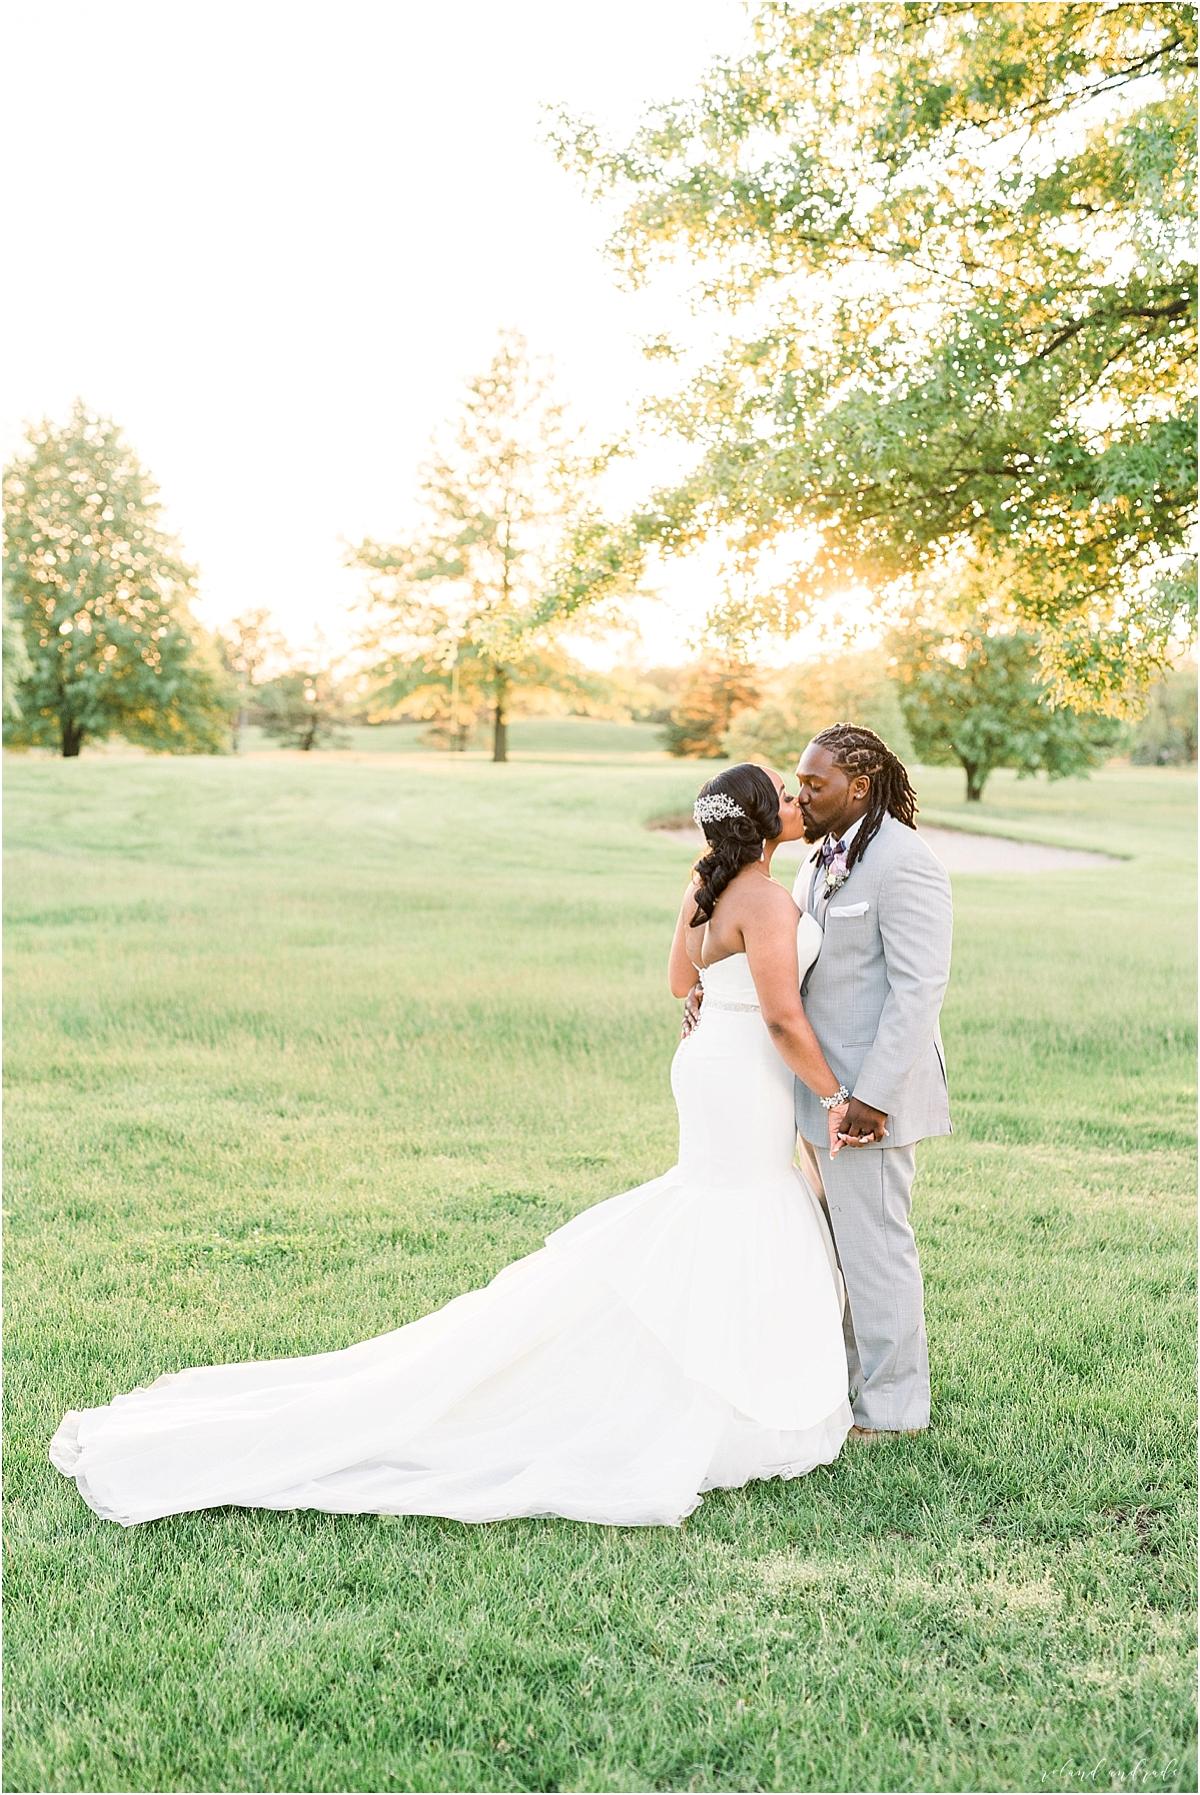 The Odyssey Wedding, Tinley Park Wedding, Chicago Wedding Photographer, Best Photographer In Tineley Park, Best Photographer In Chicago, Light And Airy Photographer_0068.jpg